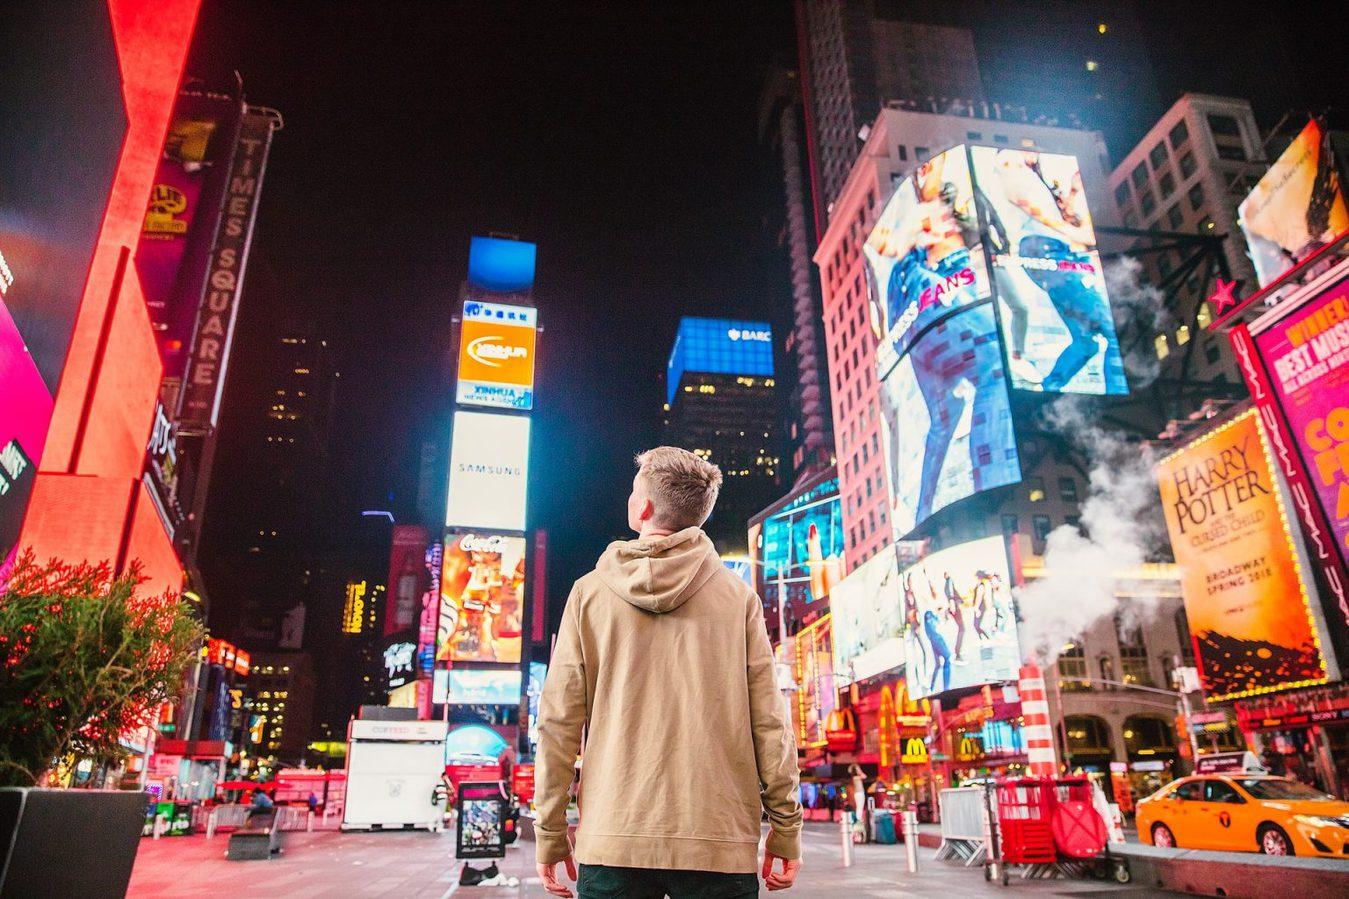 Man standing - billboards at night